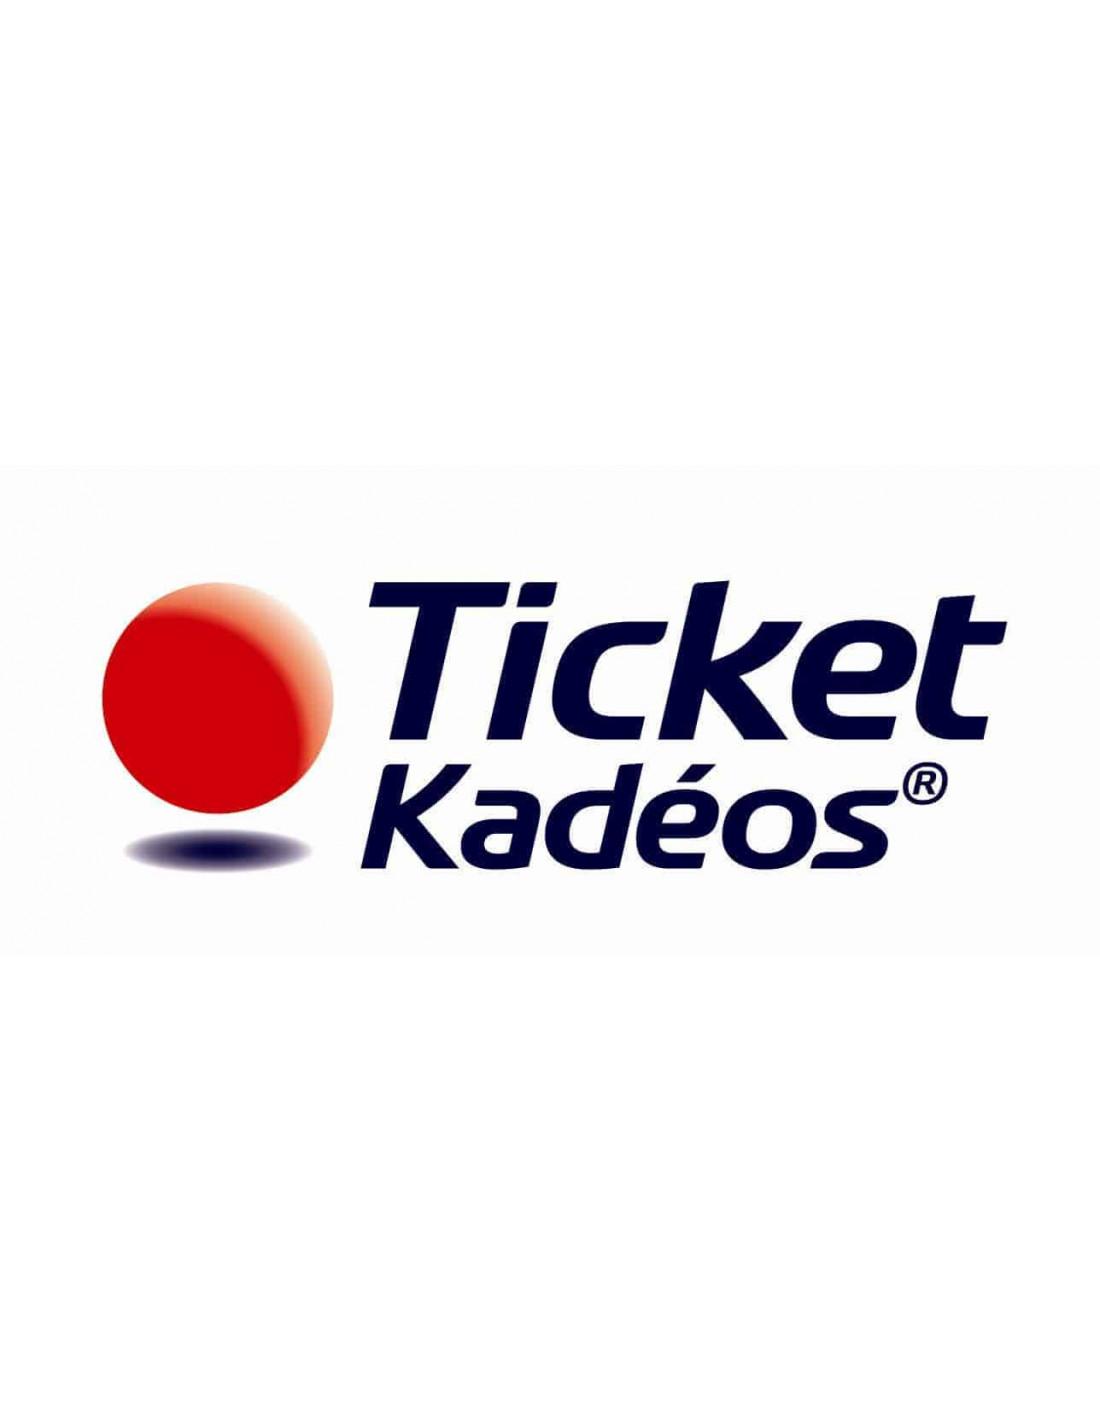 Utiliser Ticket Kadeos Infini Sur Internet : utiliser, ticket, kadeos, infini, internet, D'achat, Ticket, Kadéos, Infini, Opale